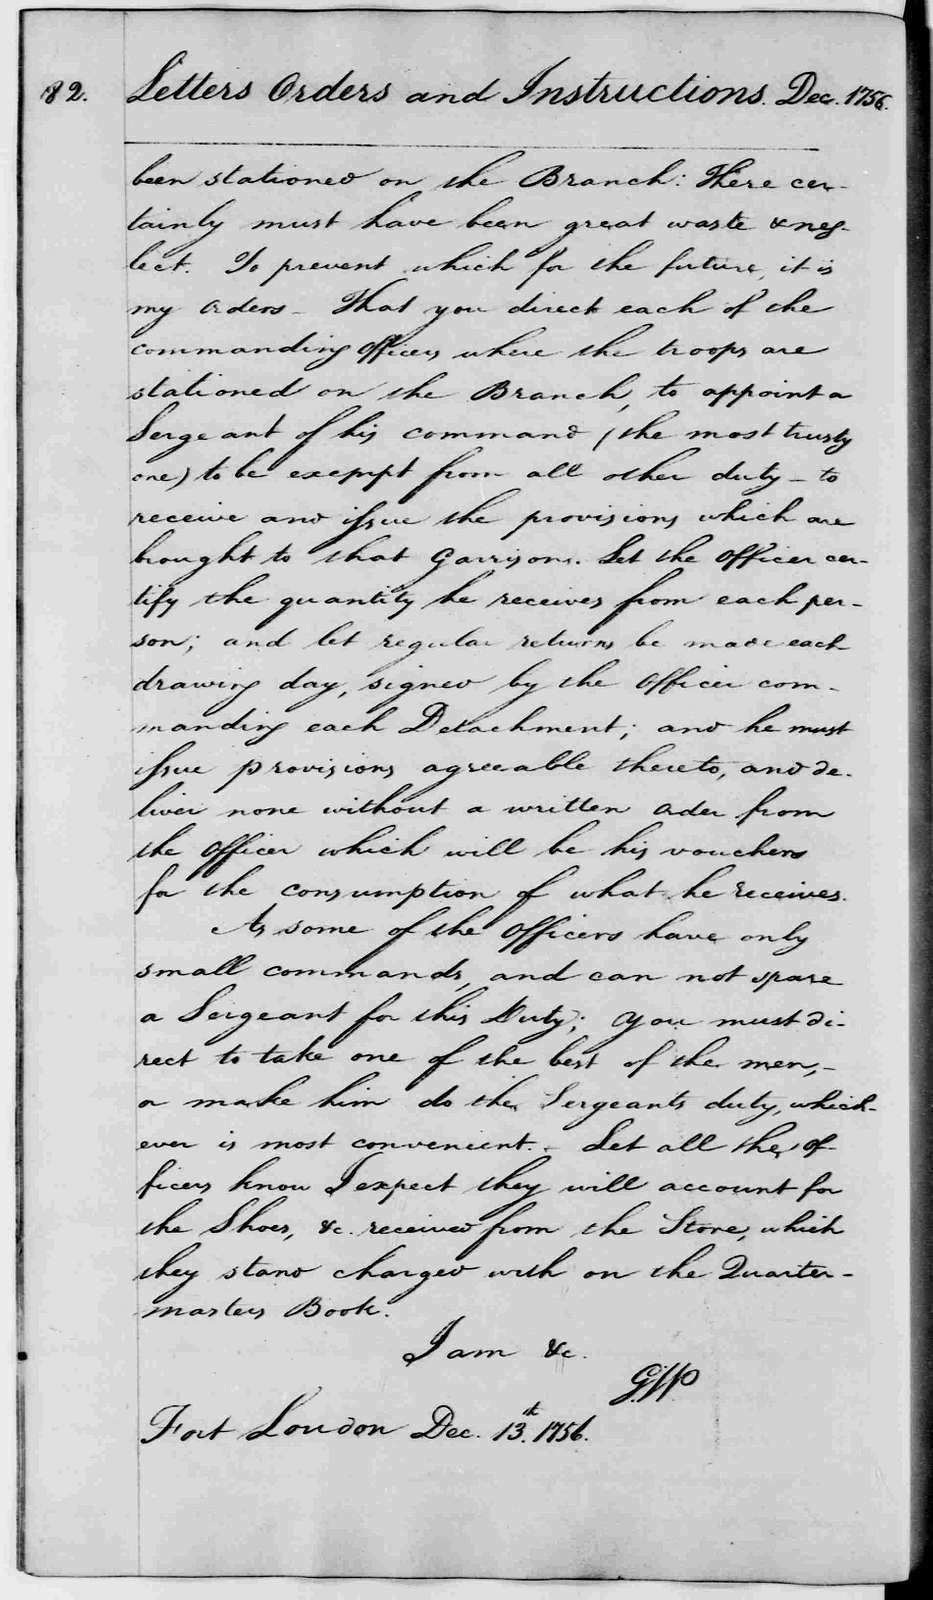 George Washington Papers, Series 2, Letterbooks 1754-1799: Letterbook 4, Sept. 19, 1756 - April 26, 1758